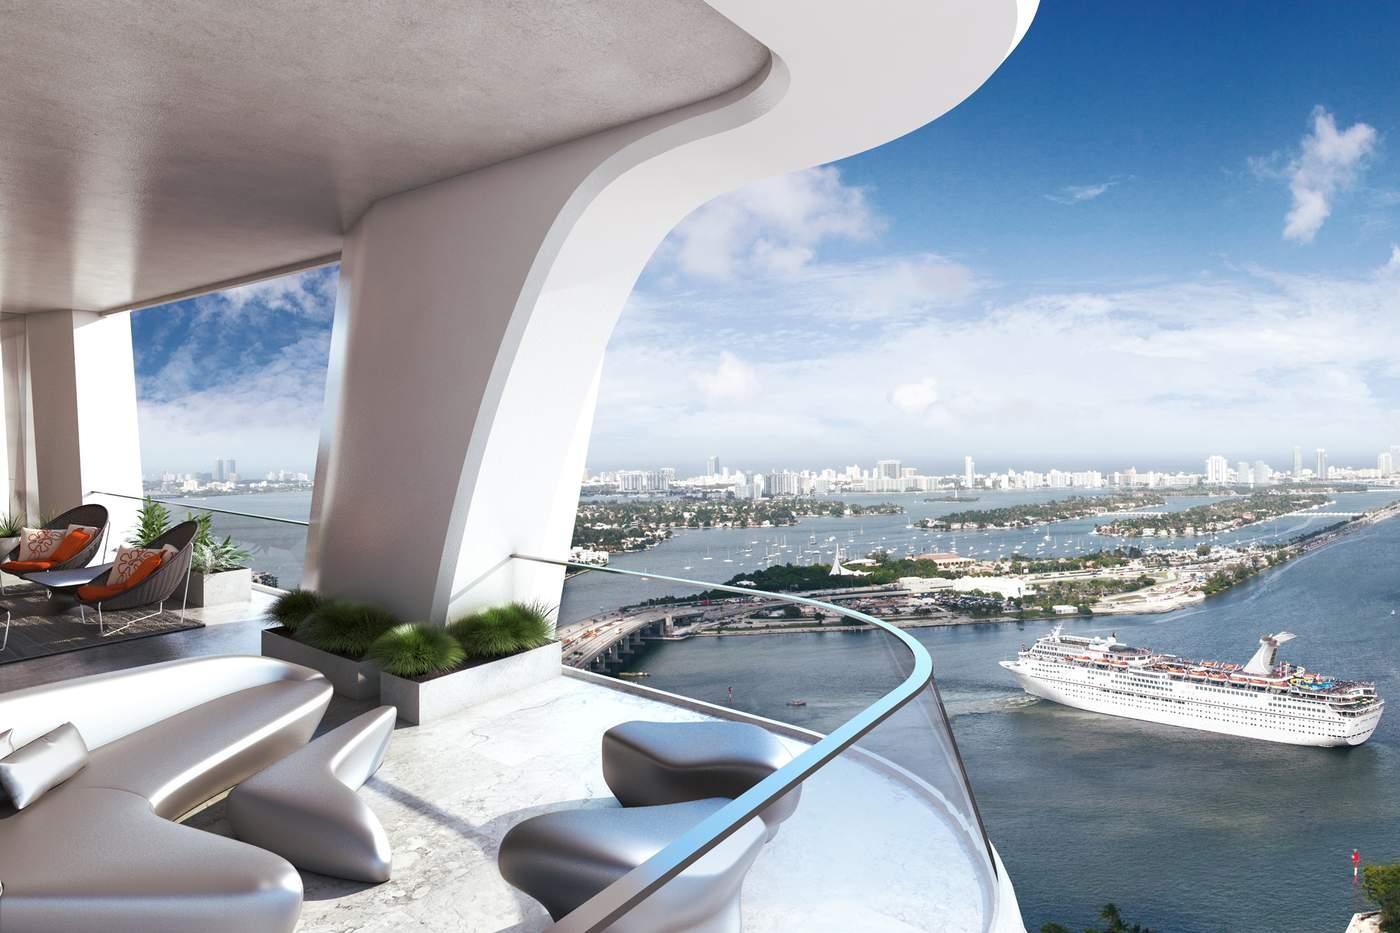 Sales Tax In Miami Beach Florida